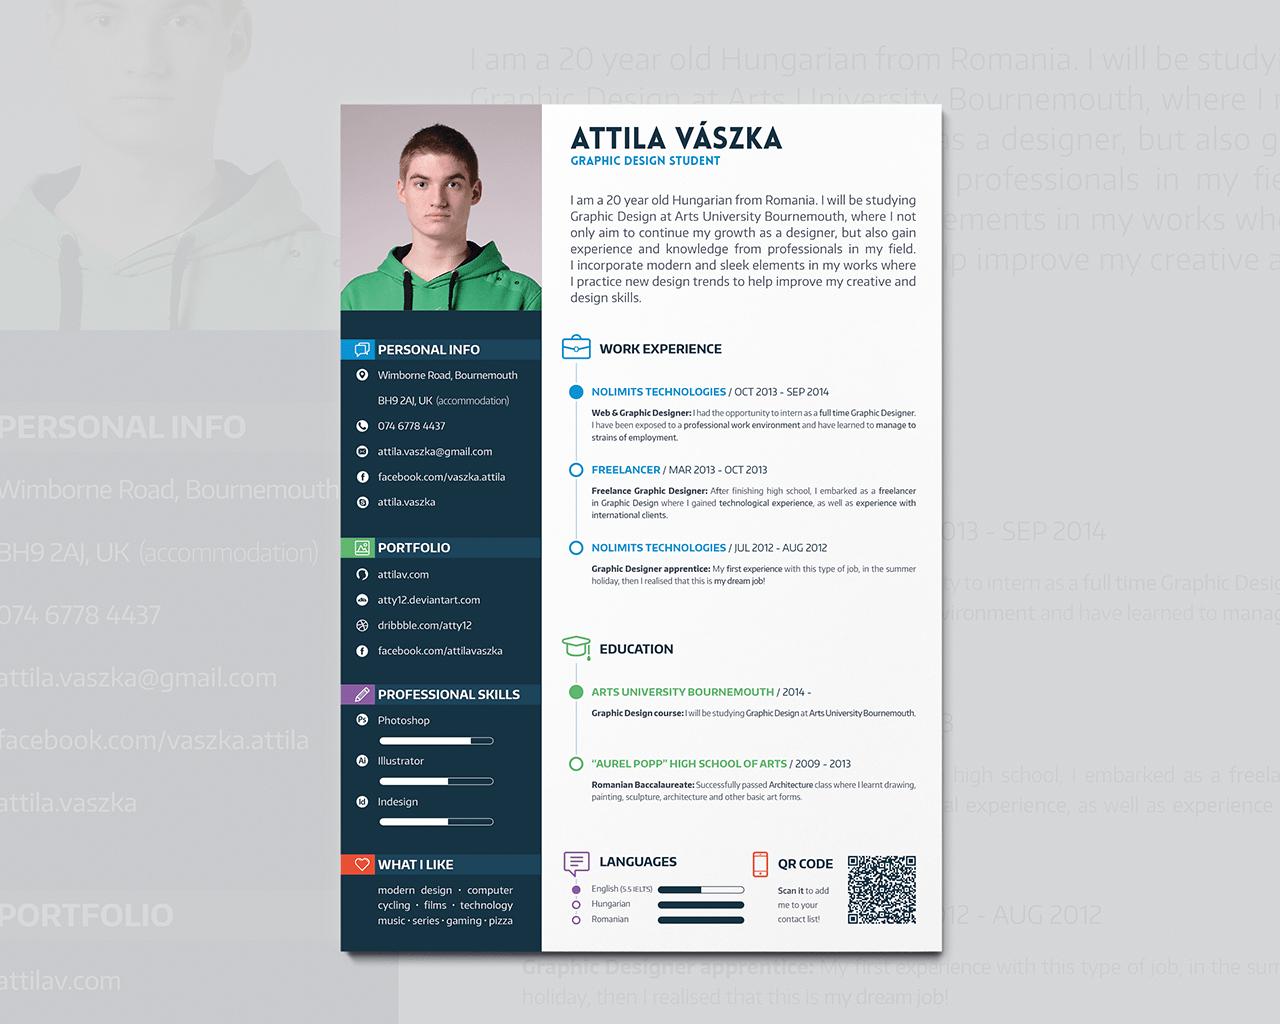 Resume Template For Graphic Designer 20 Free Cv Resume Templates 2017  Freebies Graphic Cv Resume Design By Atty12Deviantart On Deviantart